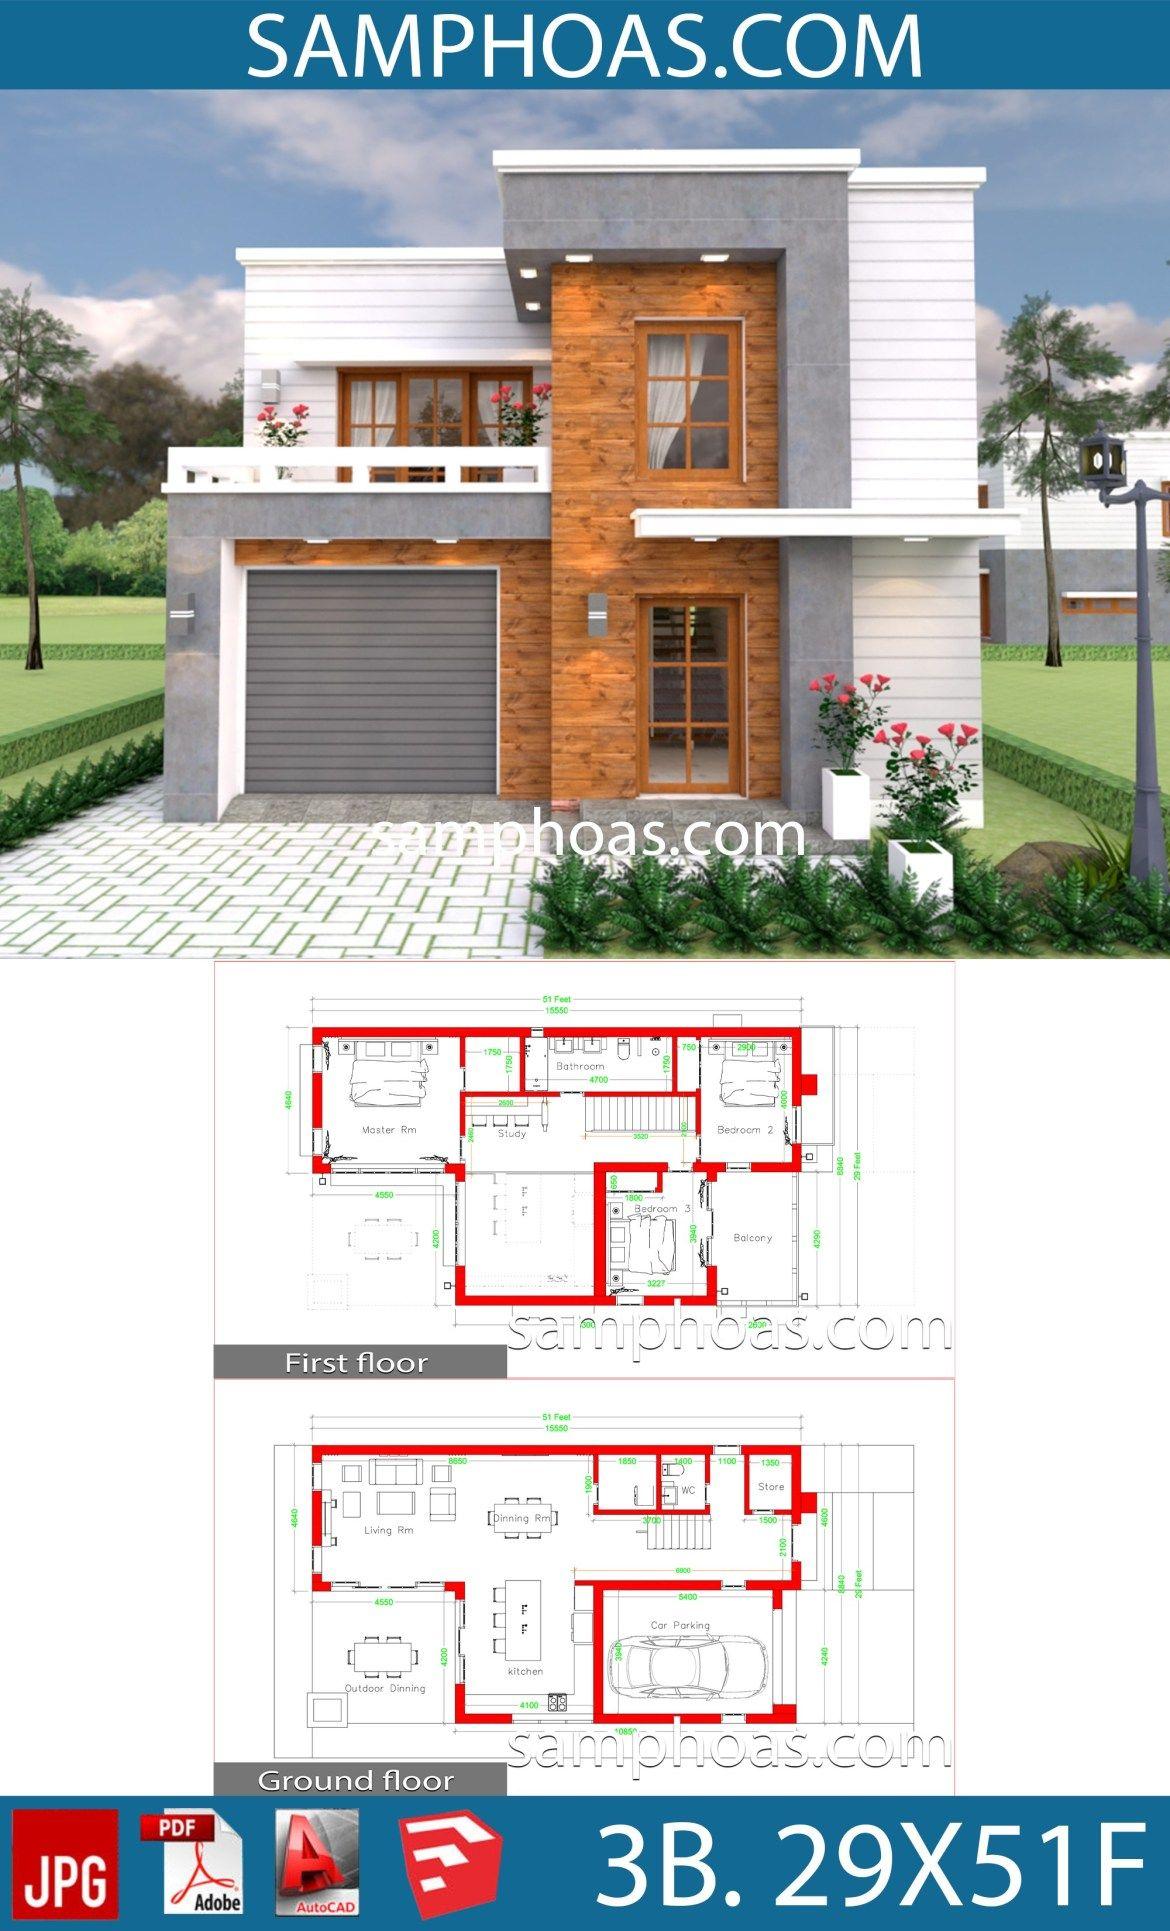 House Design Plans 29x51 Feet With 3 Bedrooms Samphoas Plansearch Beach House Floor Plans Architectural House Plans Small House Design